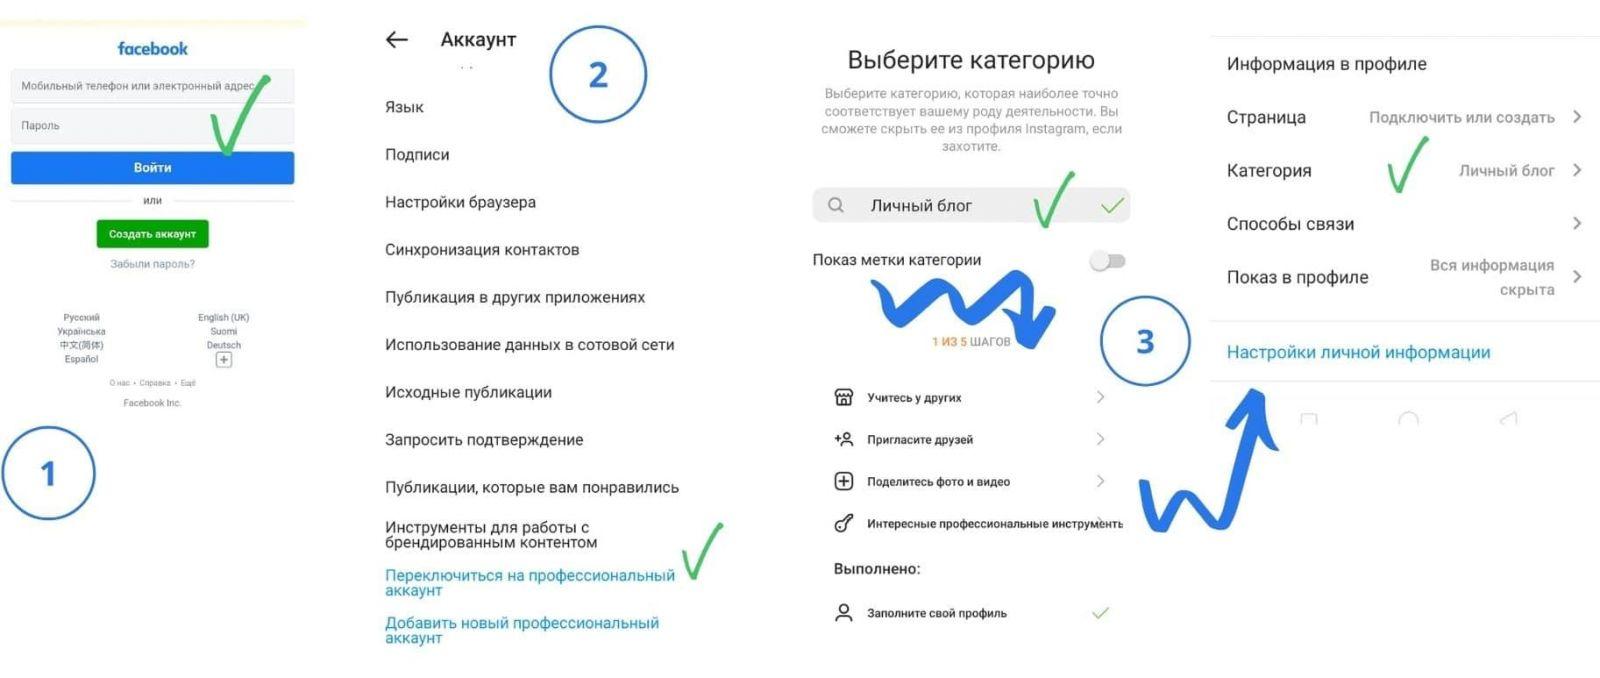 Переход на бизнес аккаунт